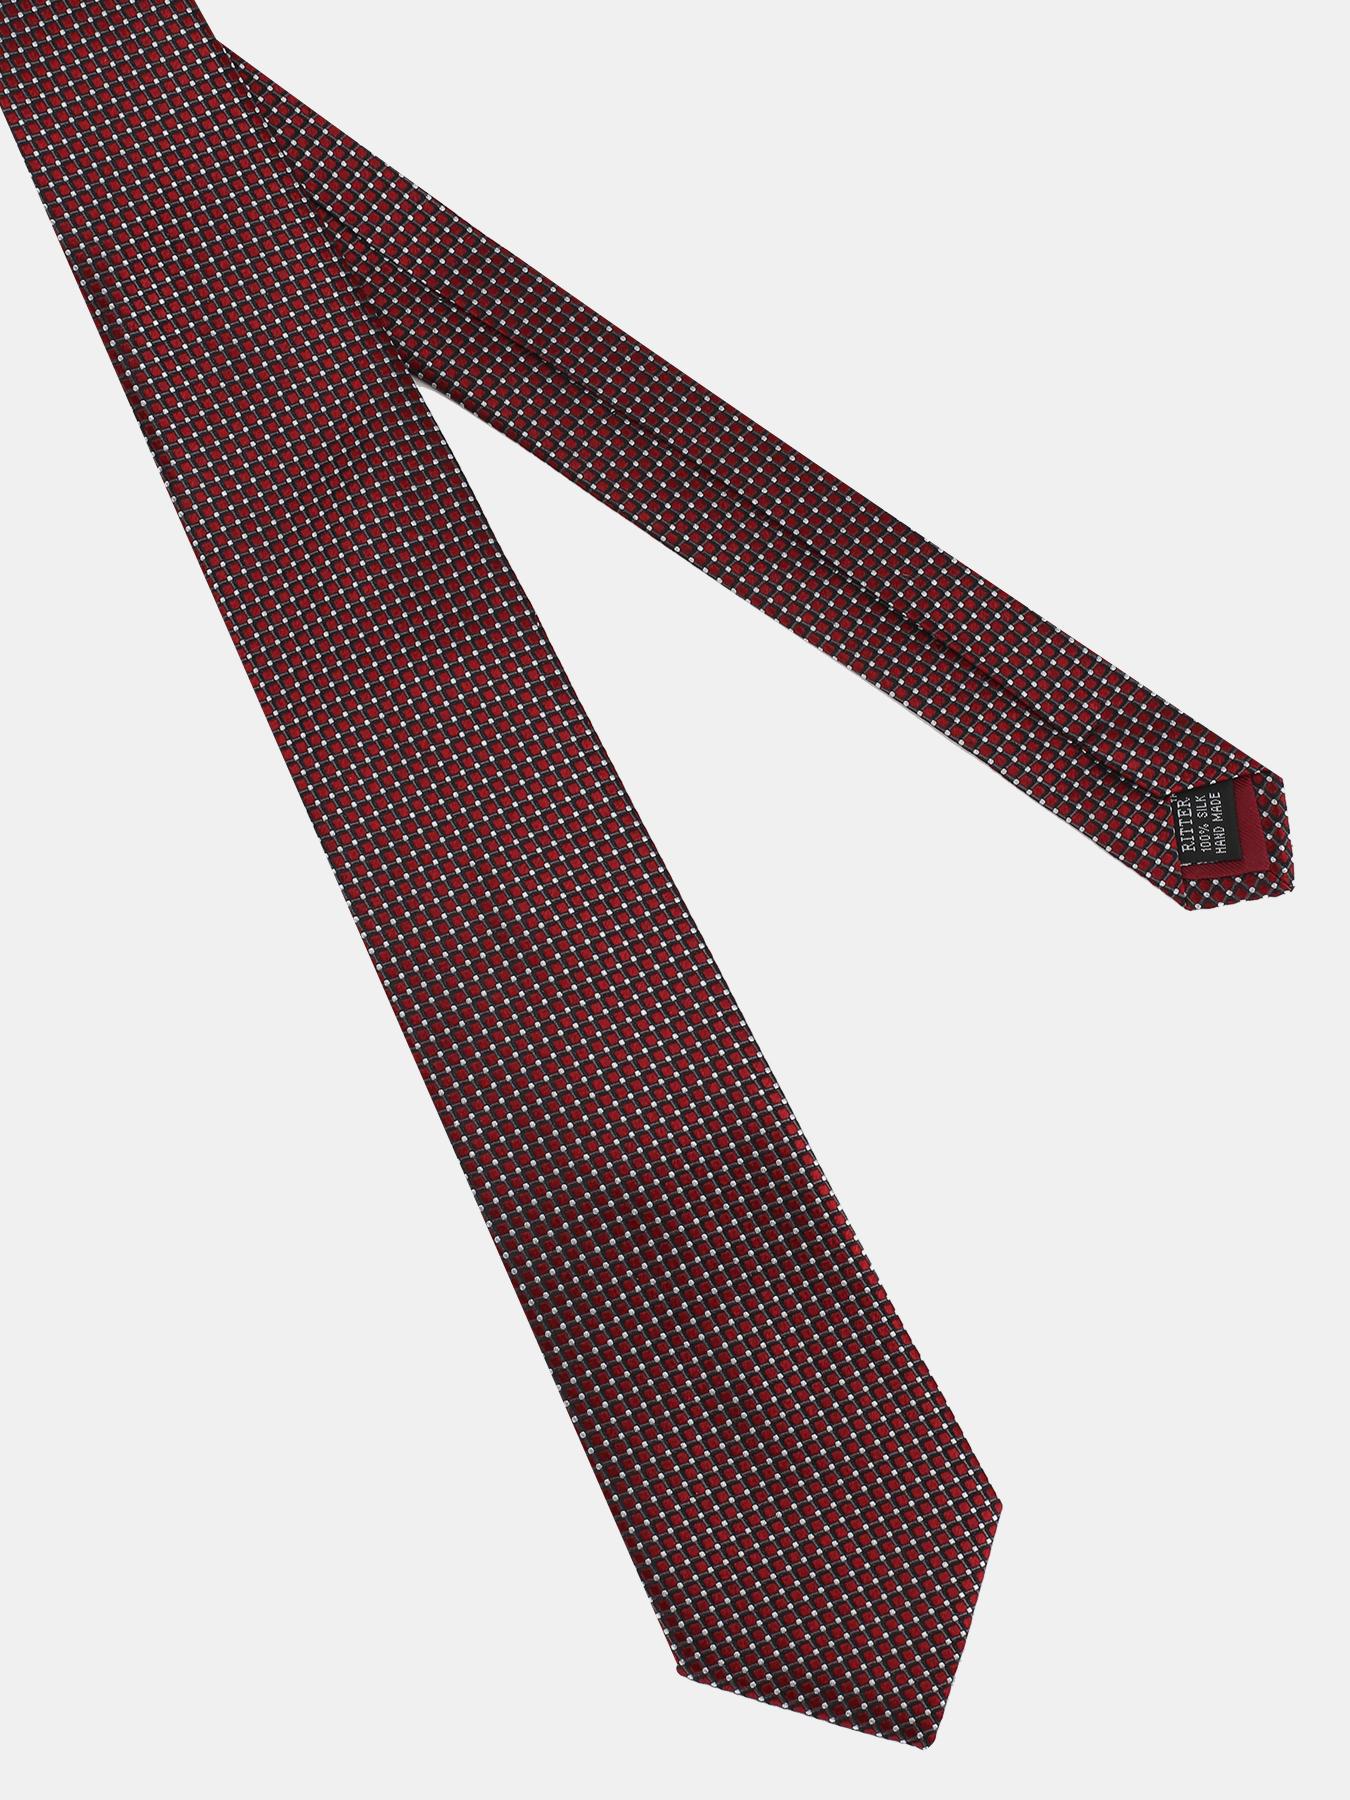 Ritter Шелковый галстук 312369-185 Фото 3